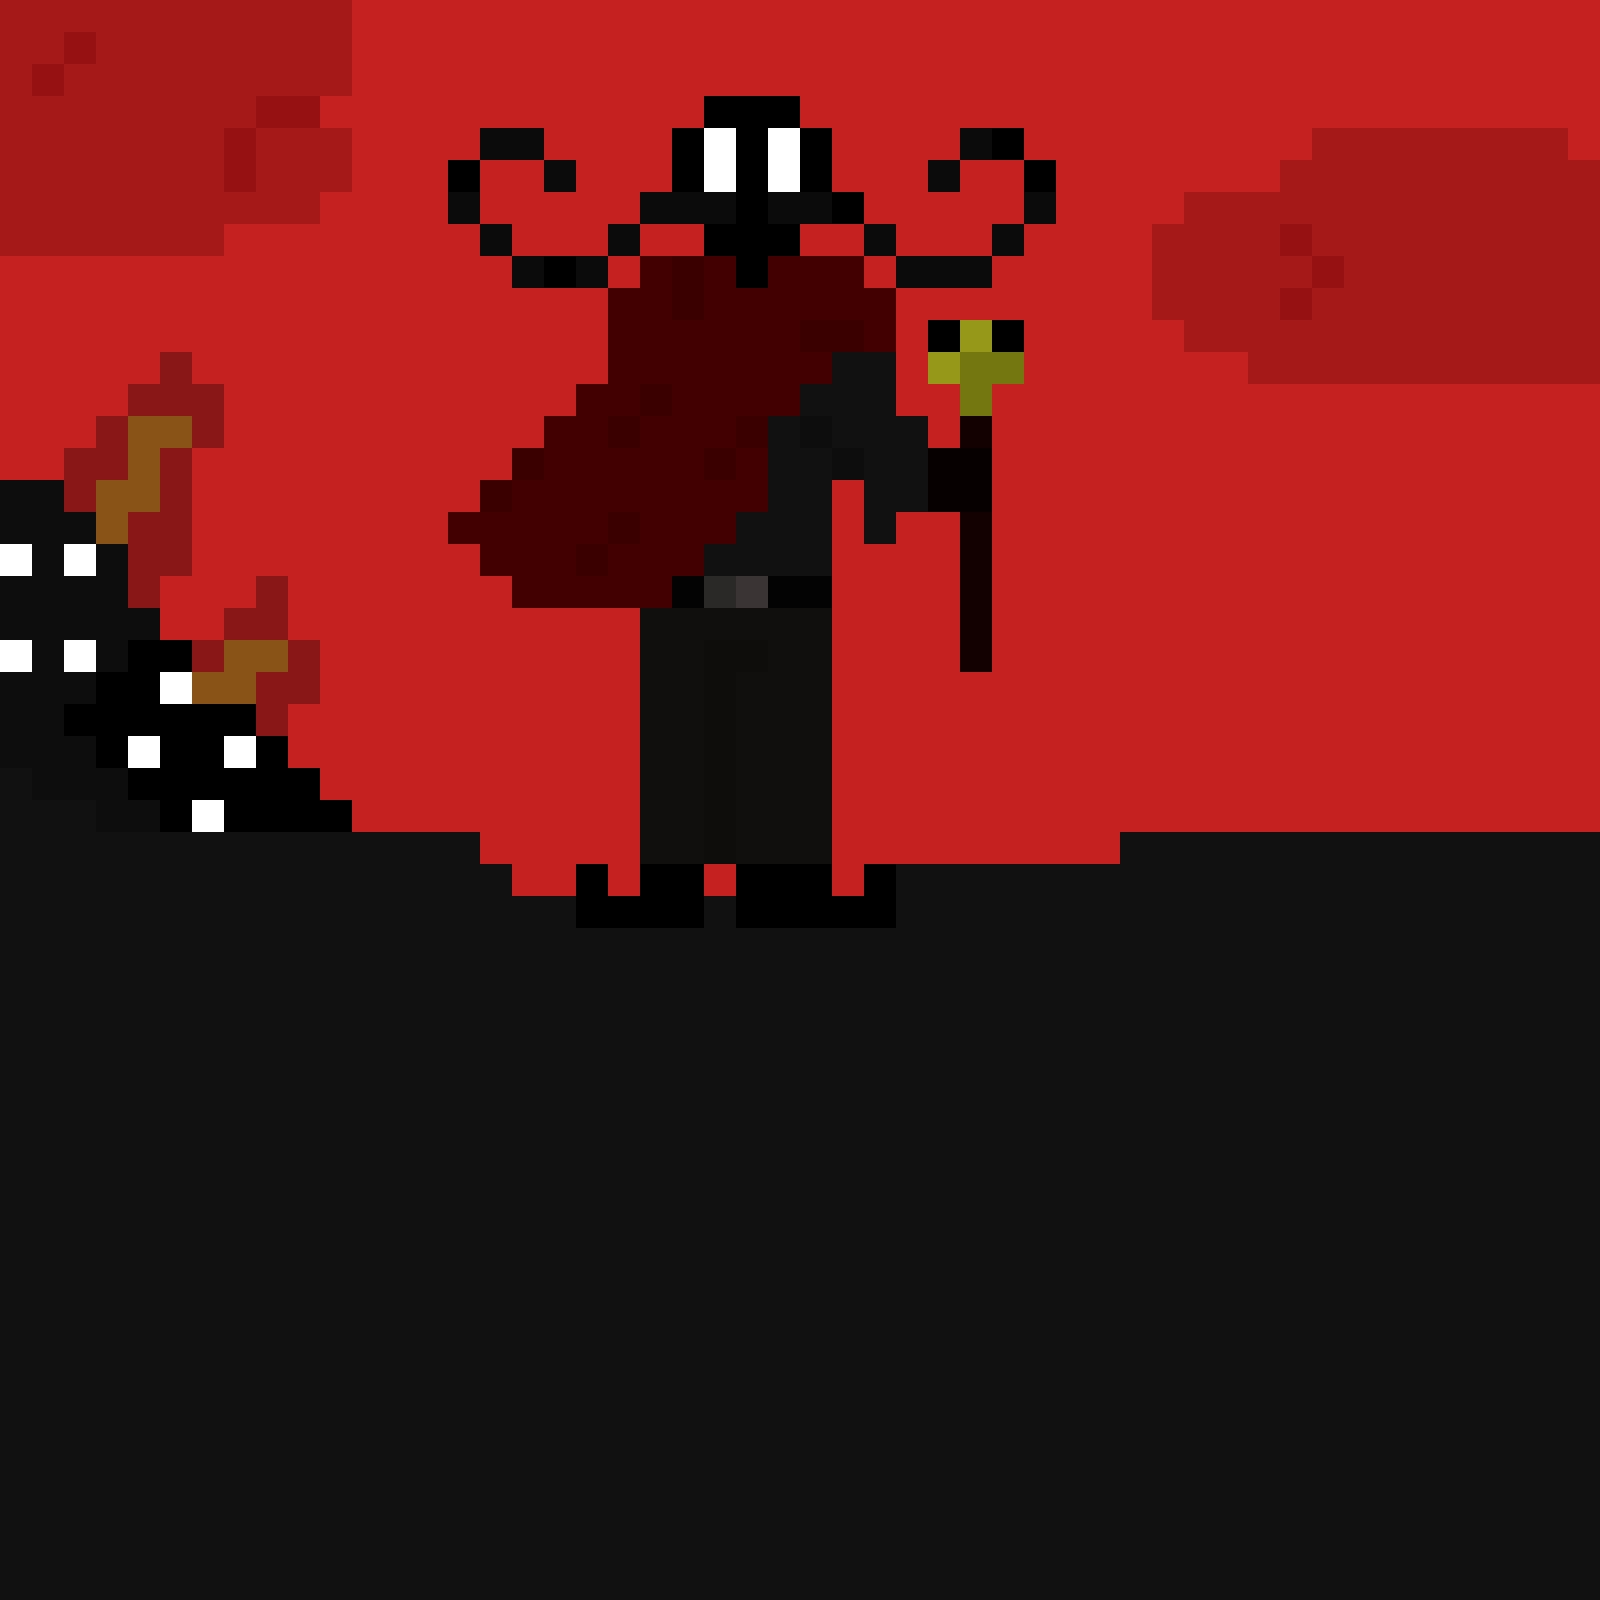 Evil Pixel Mustachio